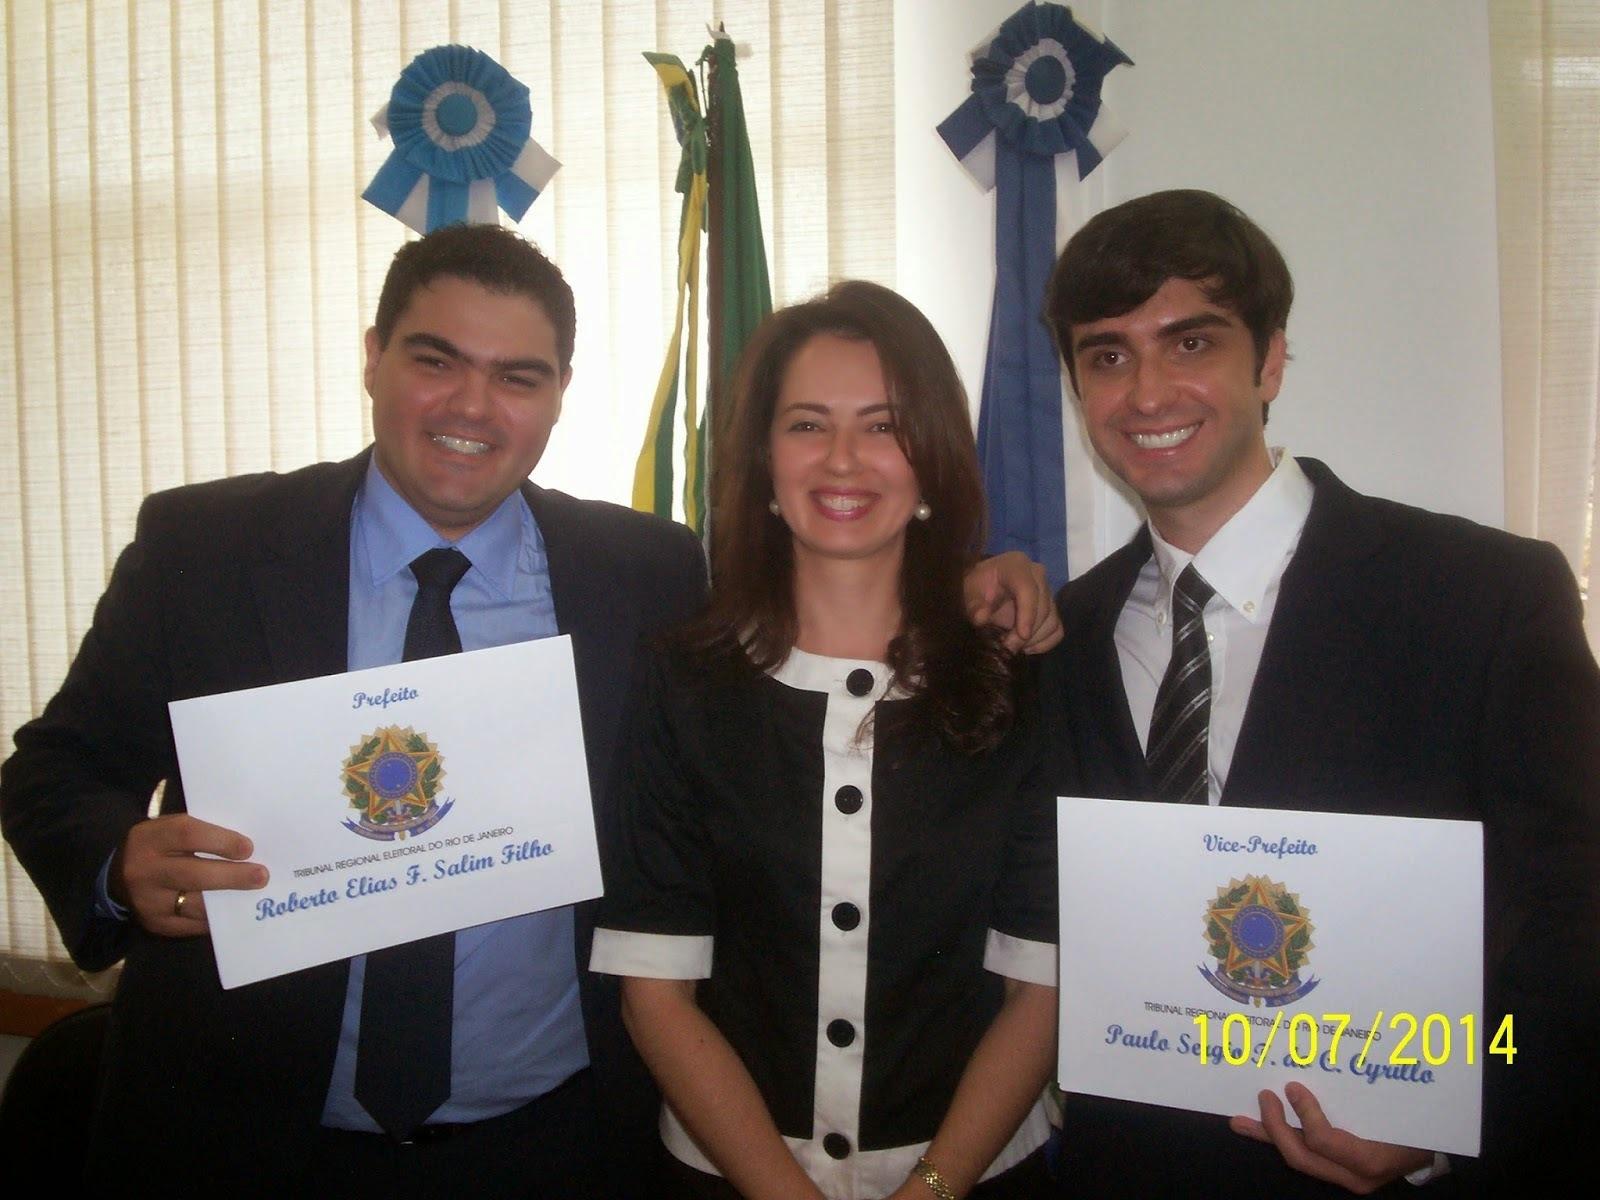 Roberto Tatu e Paulo Sérgio tomam posse da prefeitura de Bom Jesus